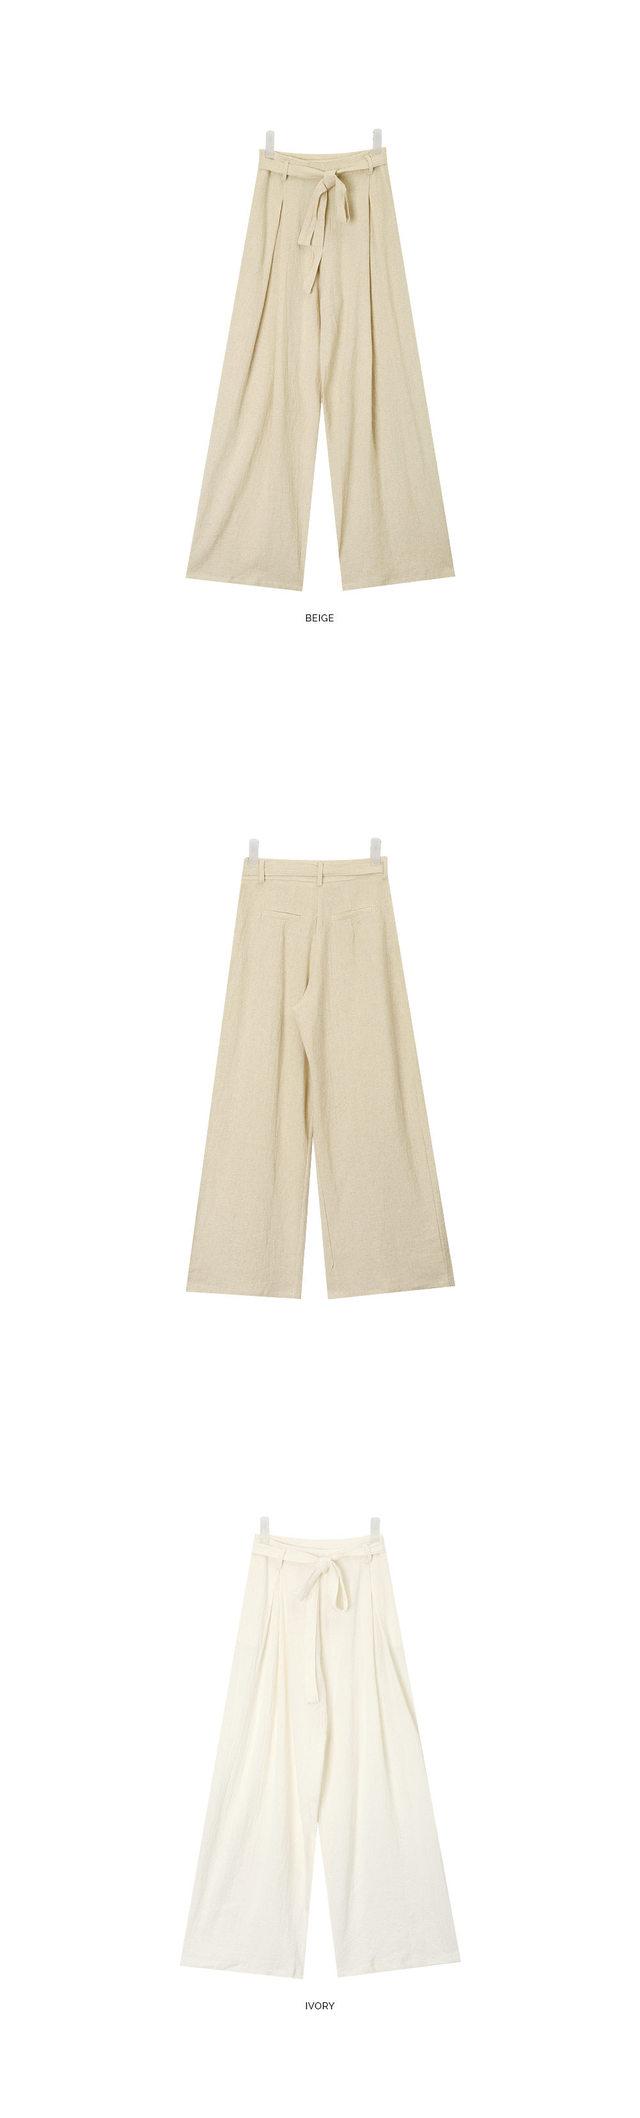 tami wide pants (s, m)